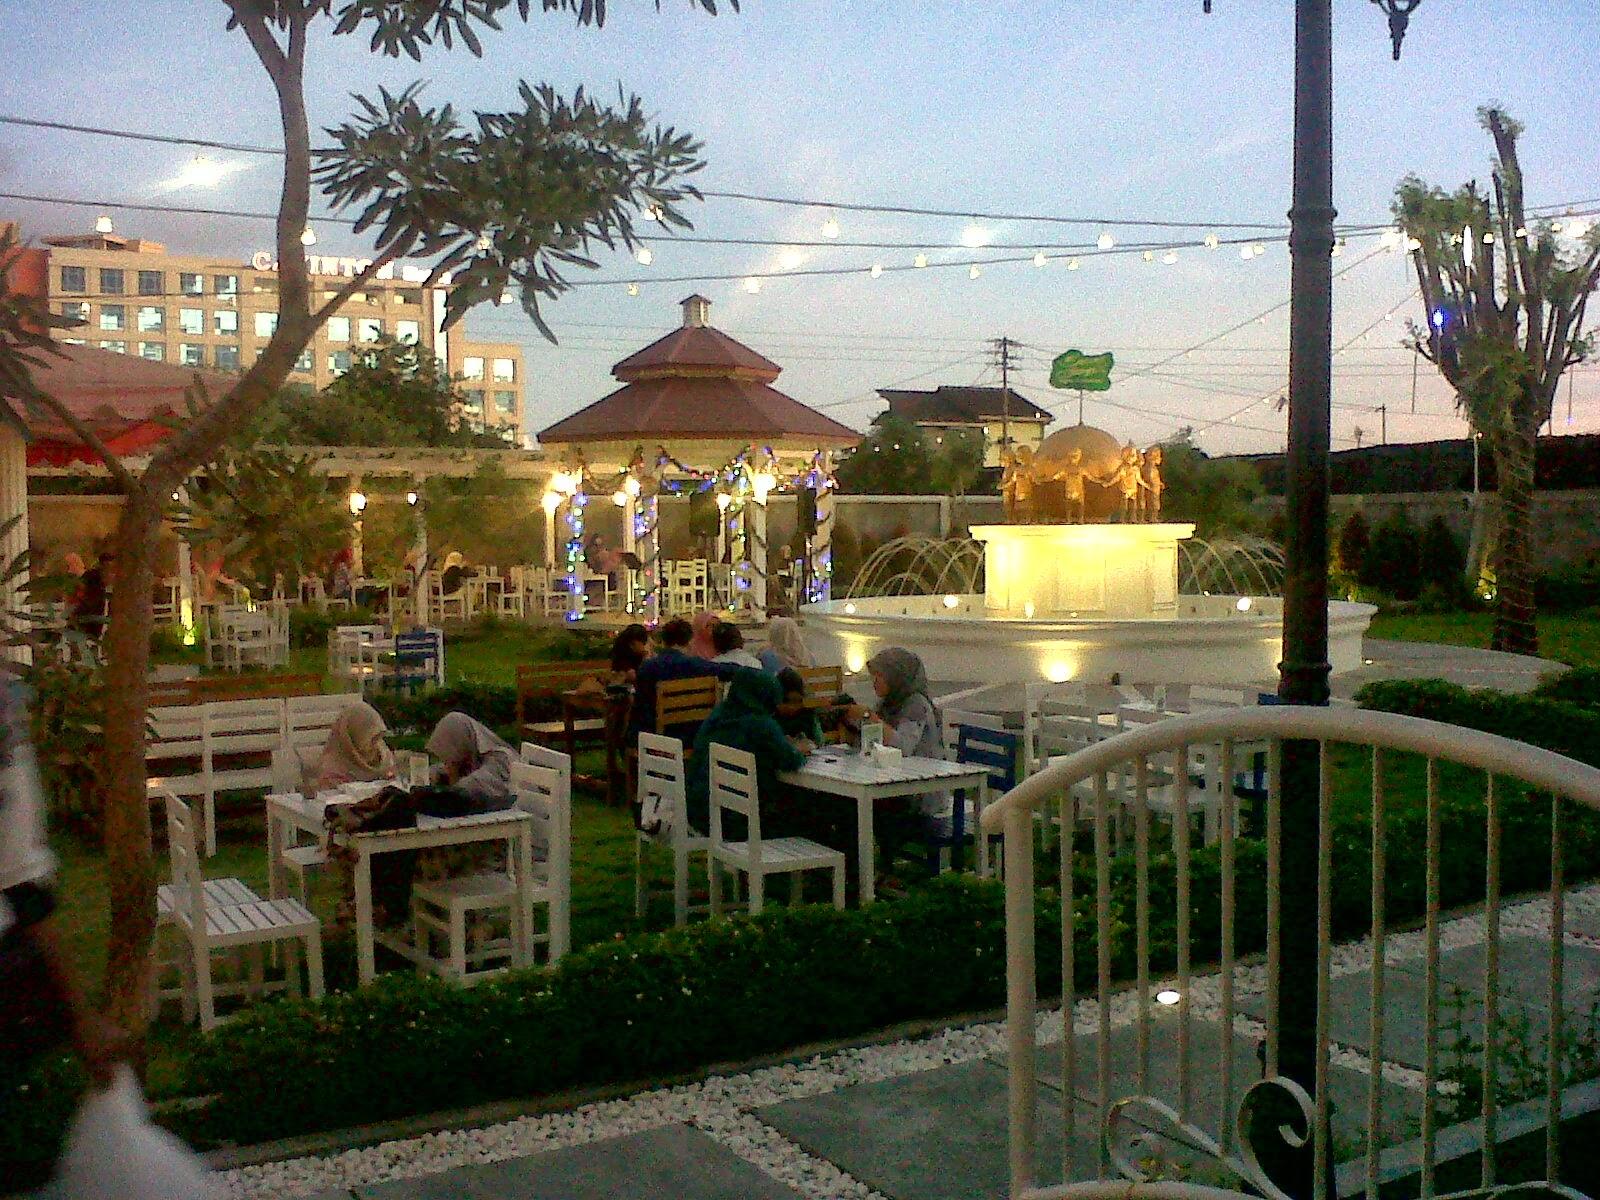 4 Destinasi Wisata Valentine Yang Romantis Di Jogjakarta